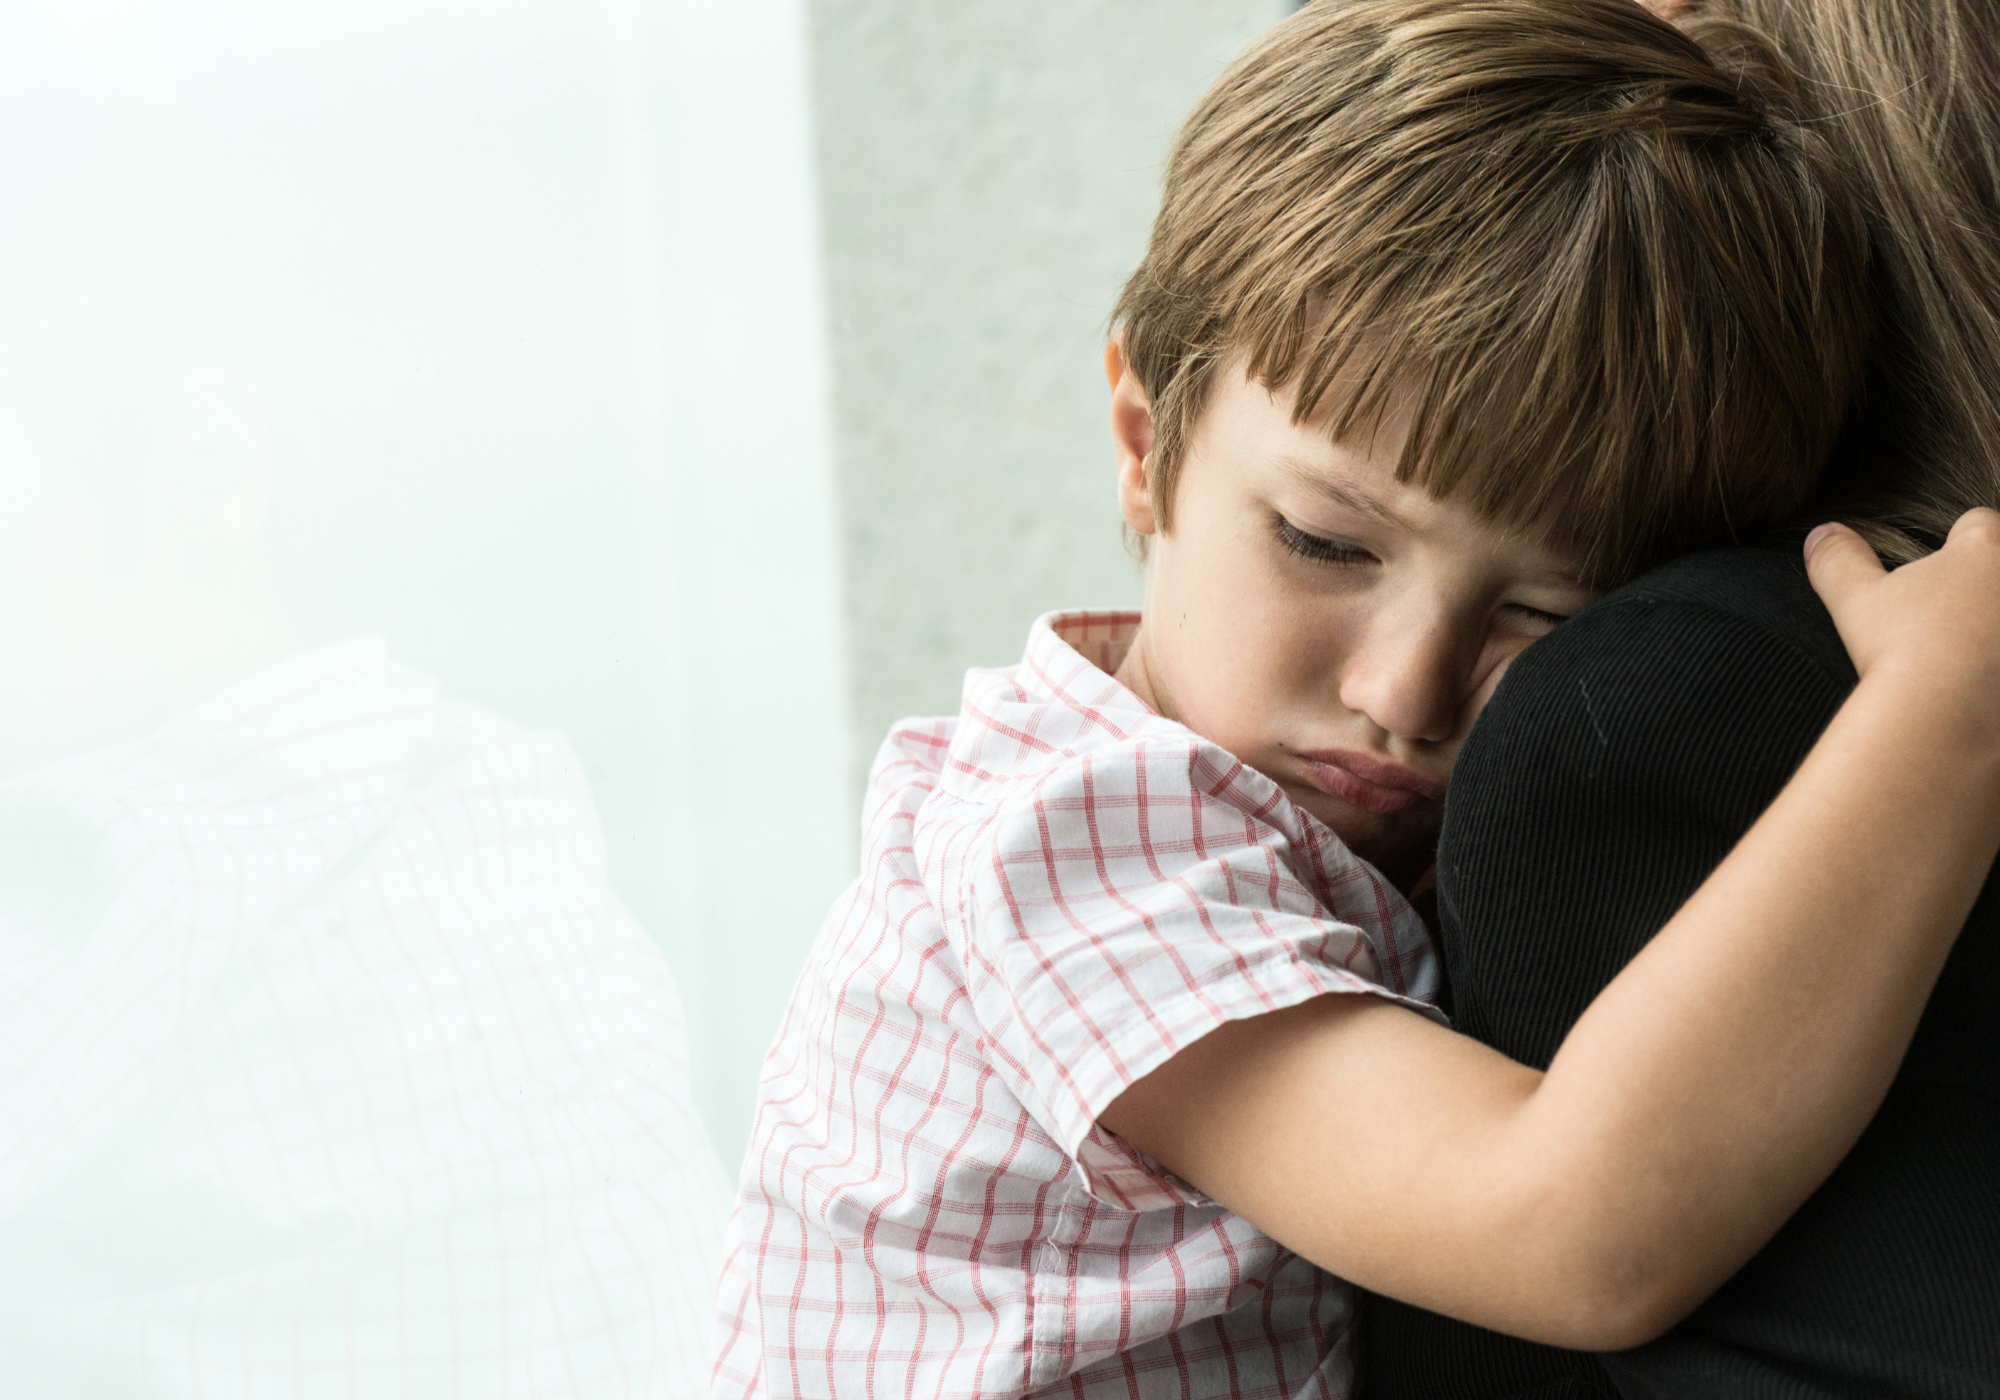 Haben Kinder Gefühle?